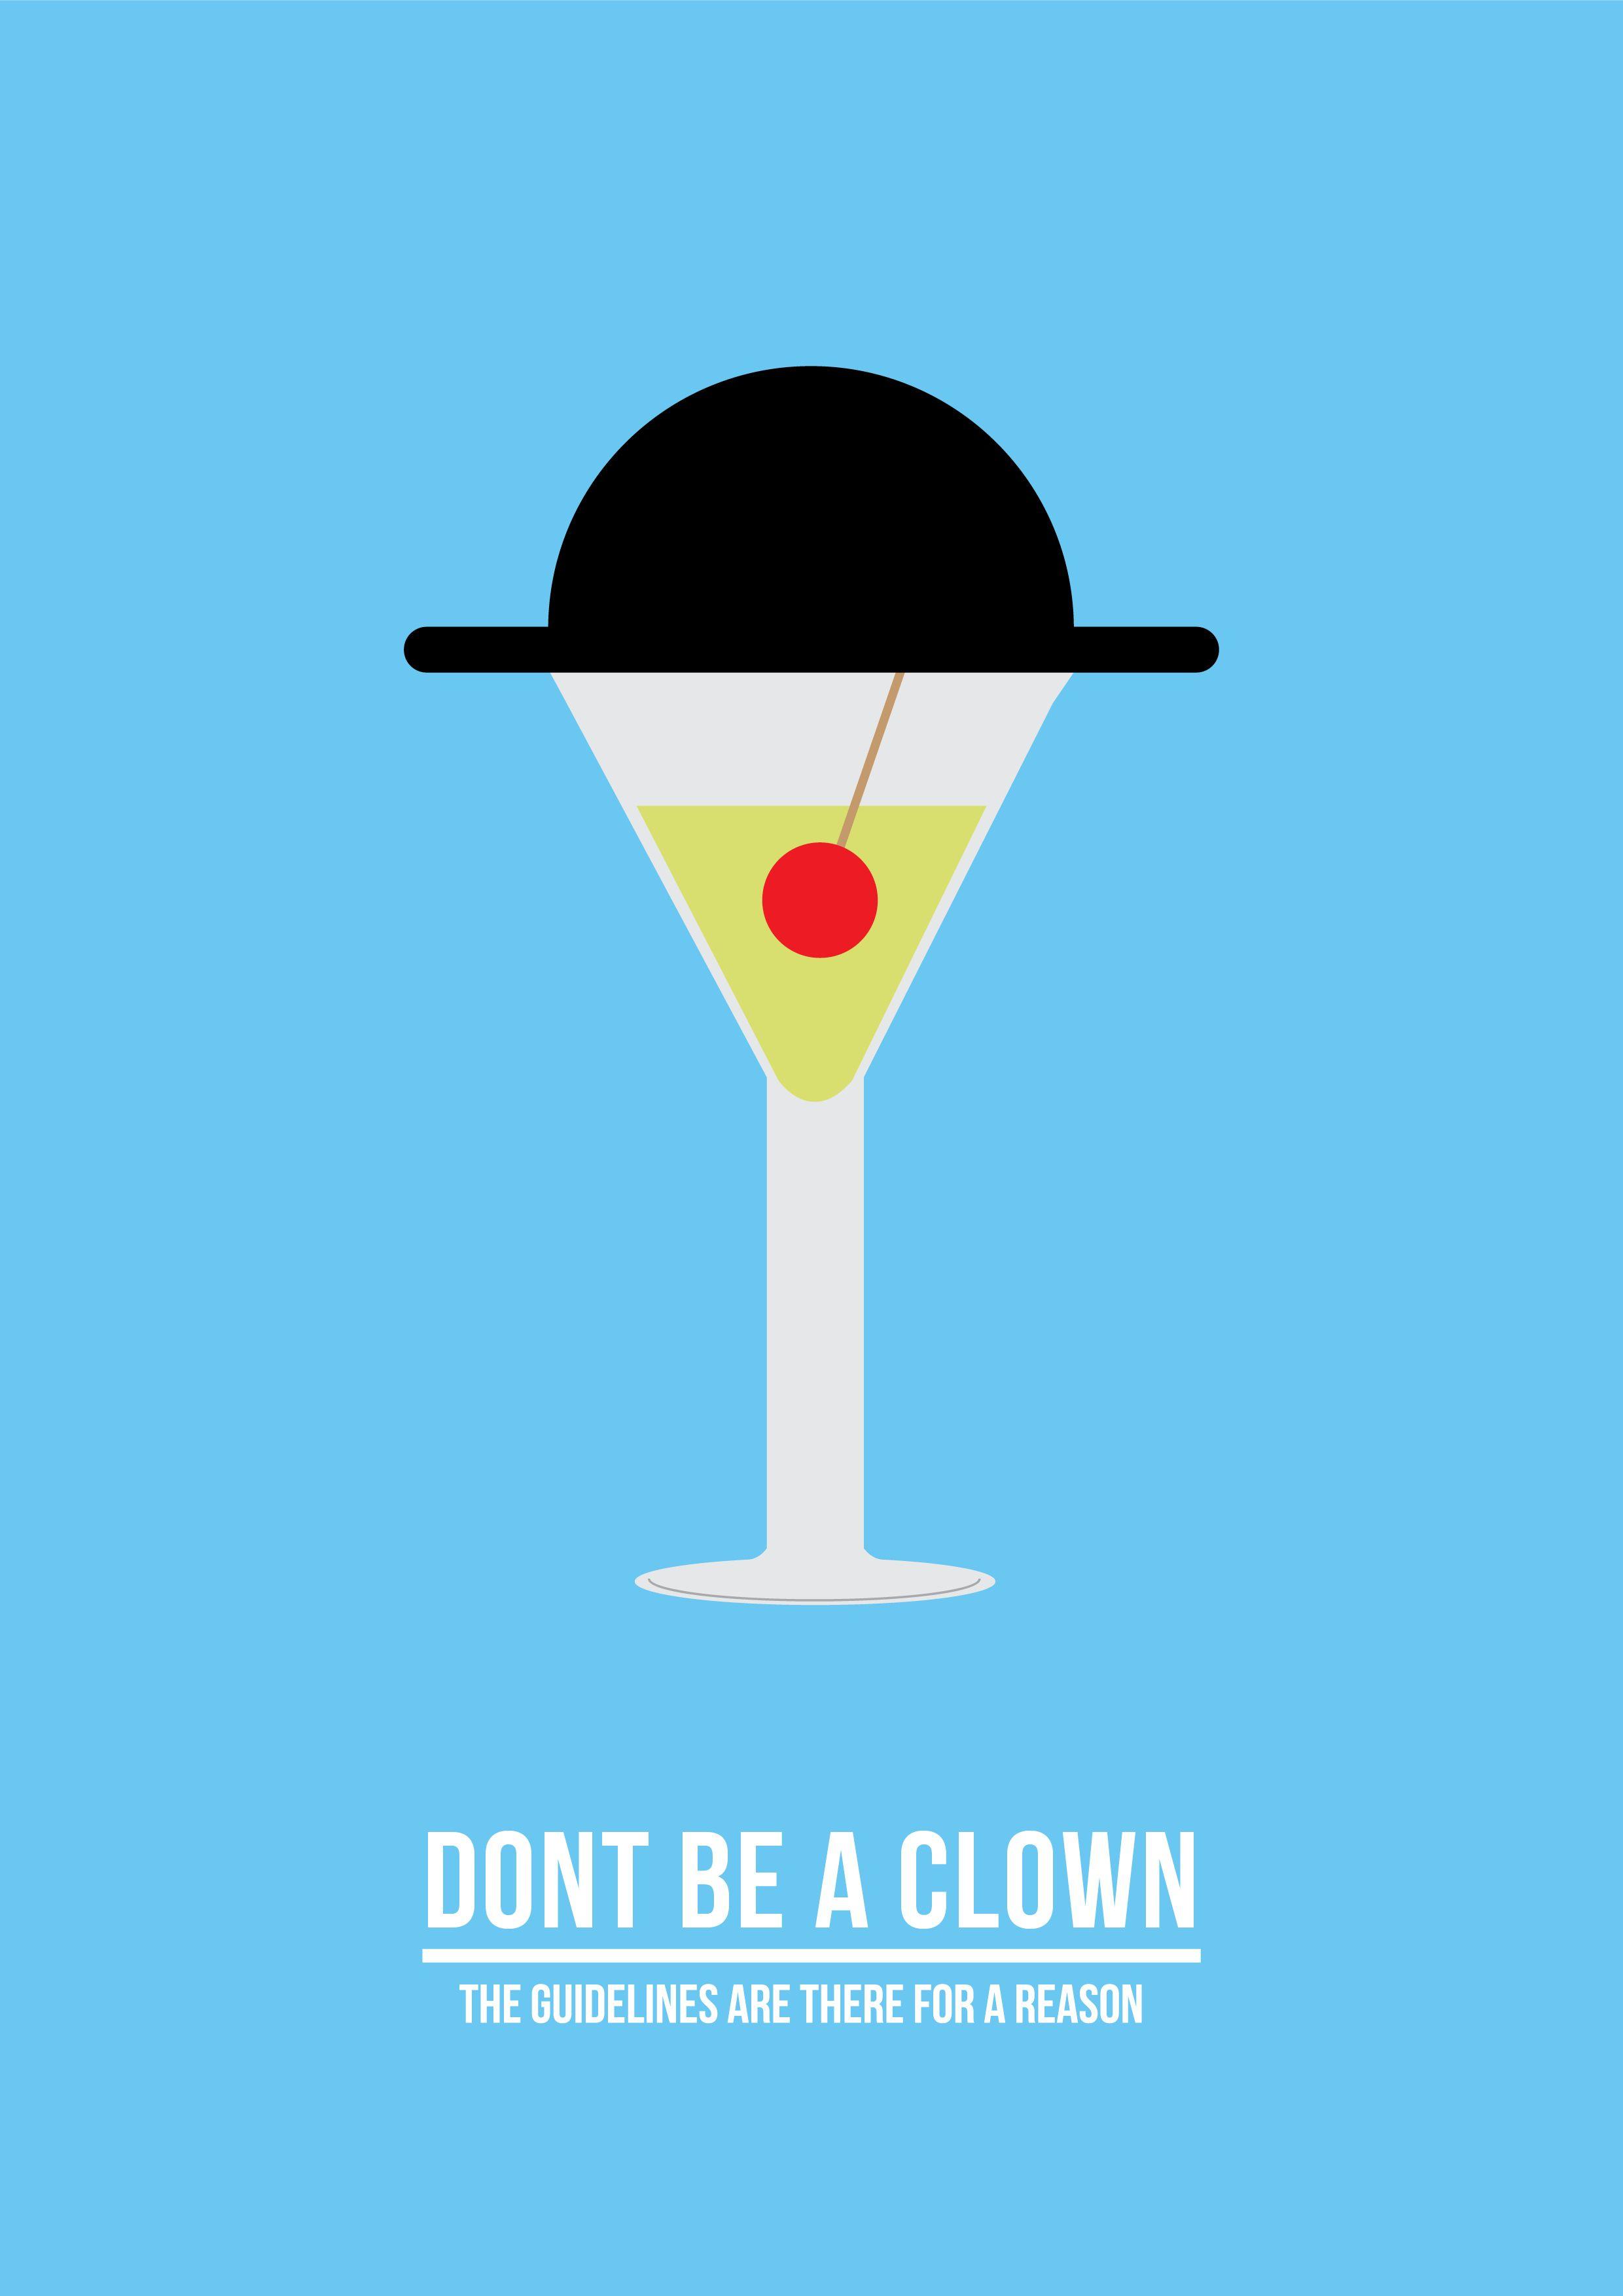 Creating Awareness For The Dangers Of Binge Drinking